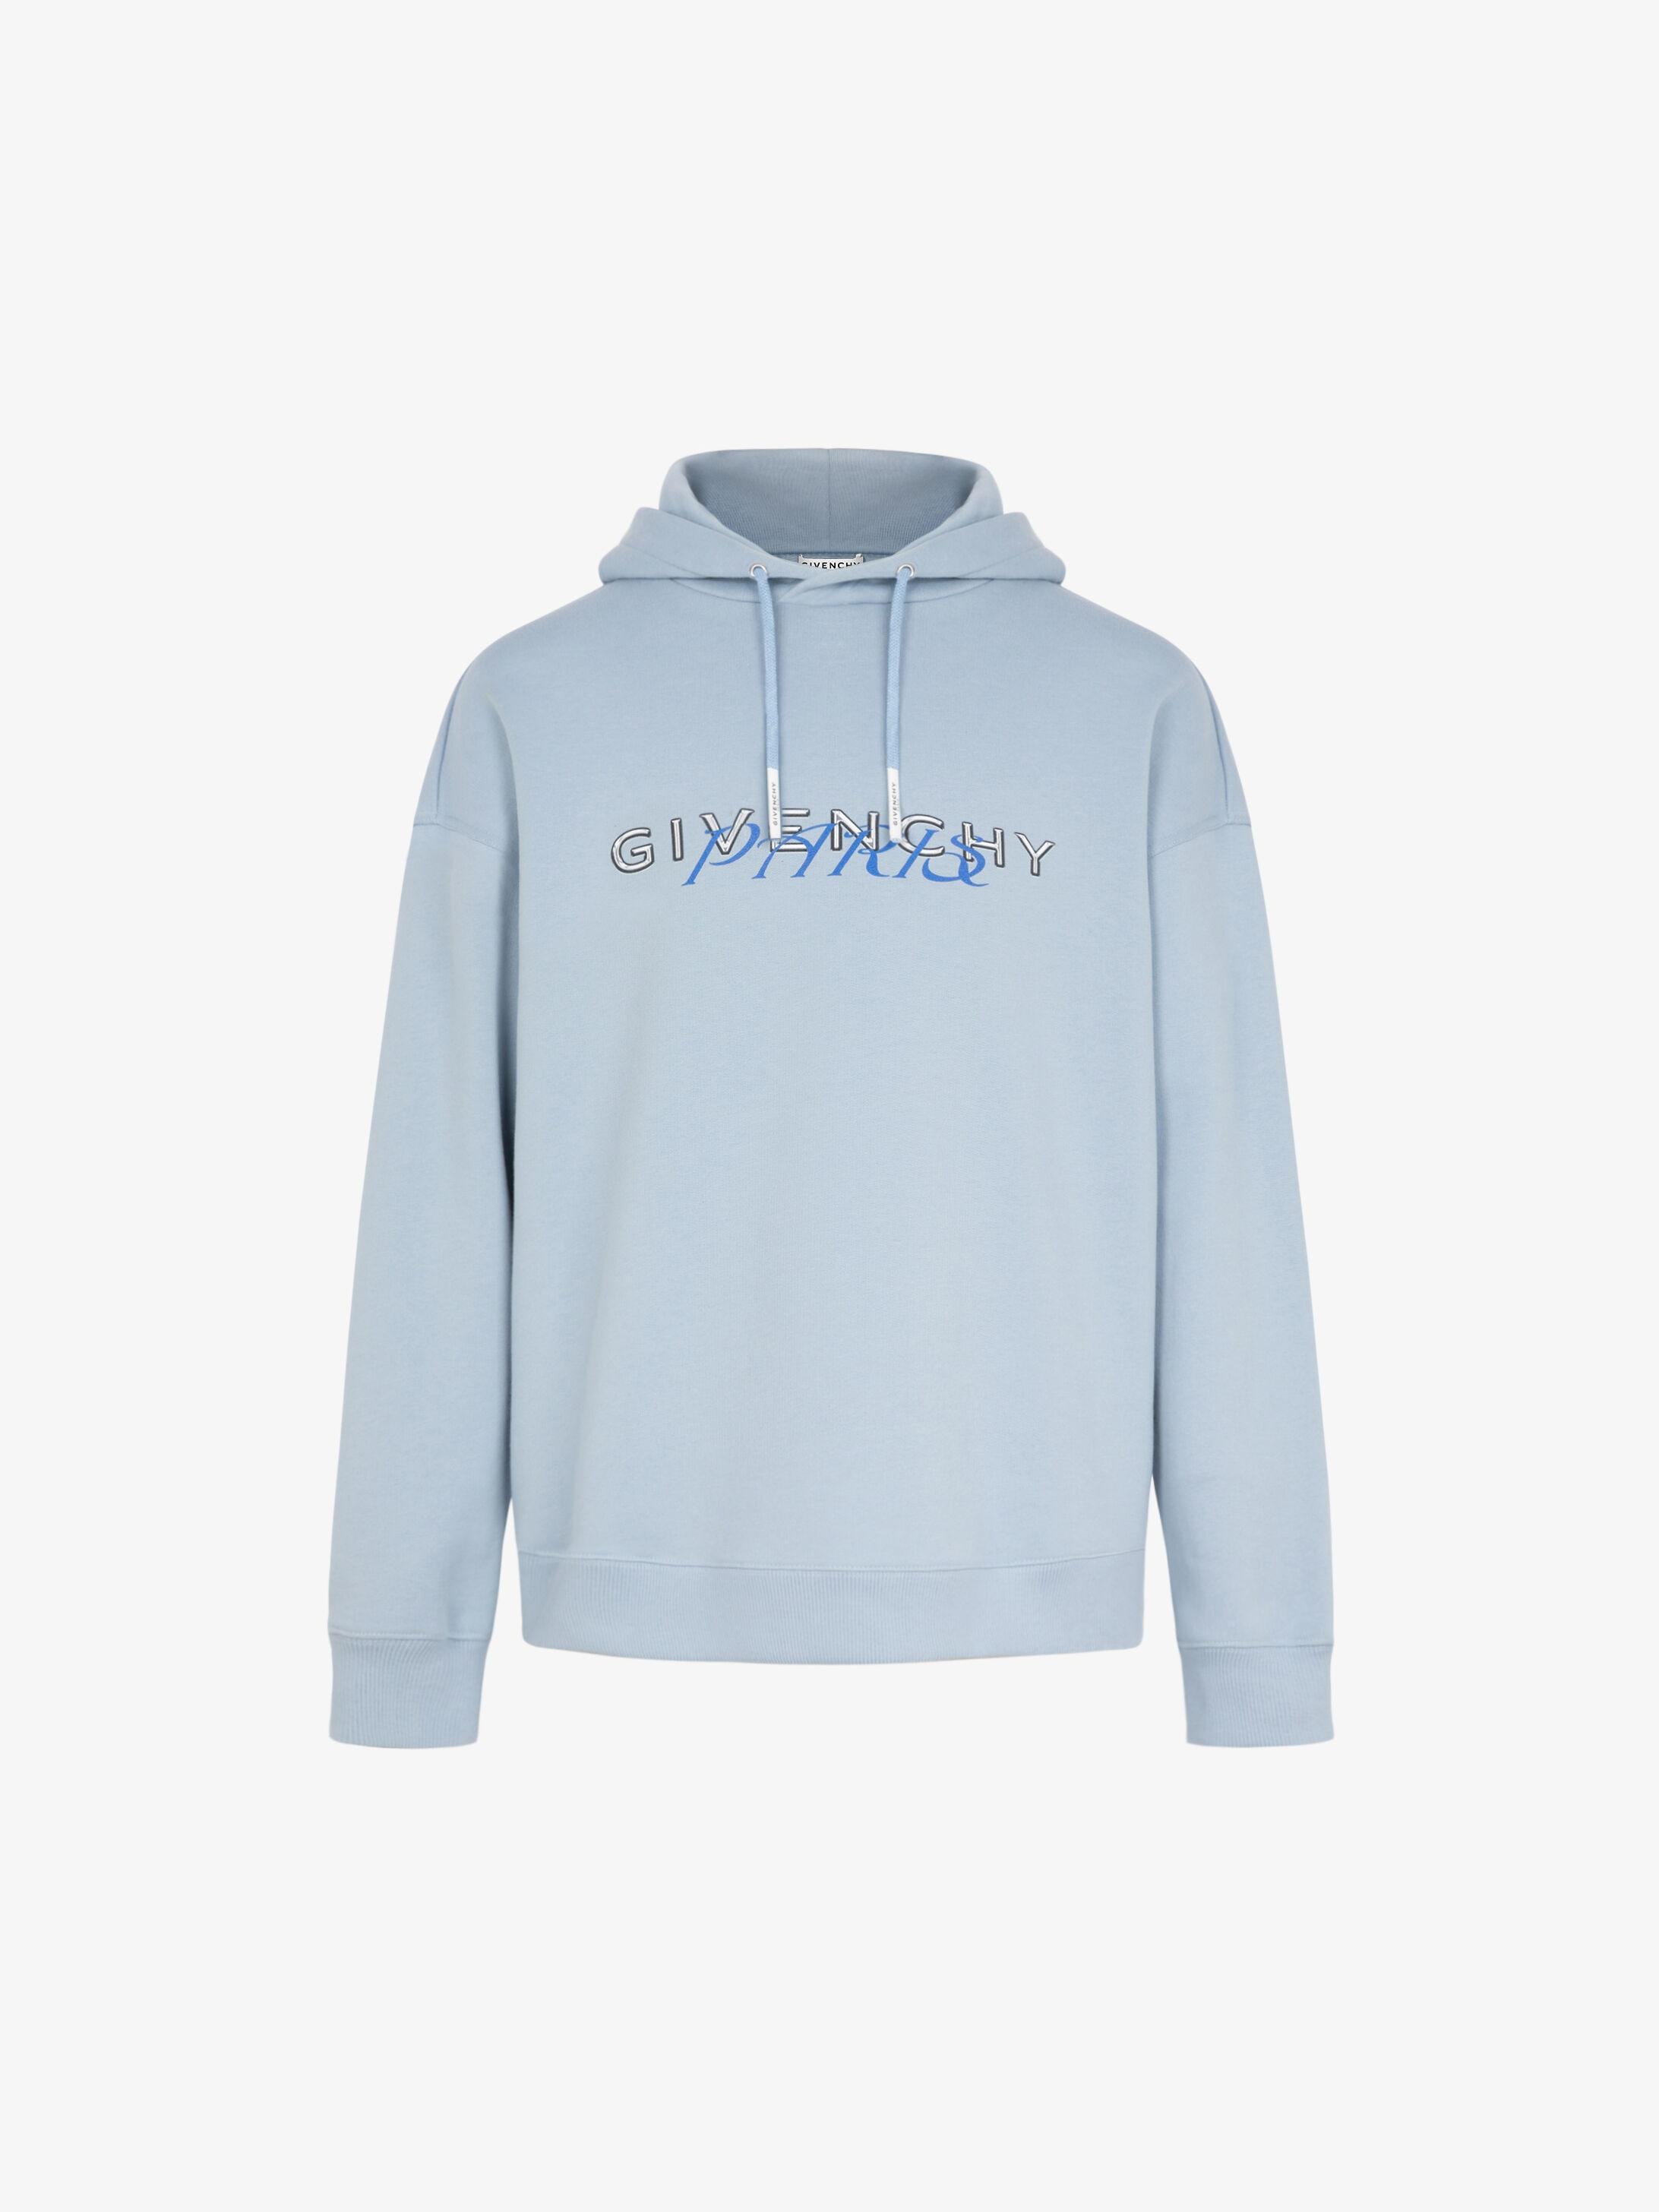 givenchy hoodie dragon